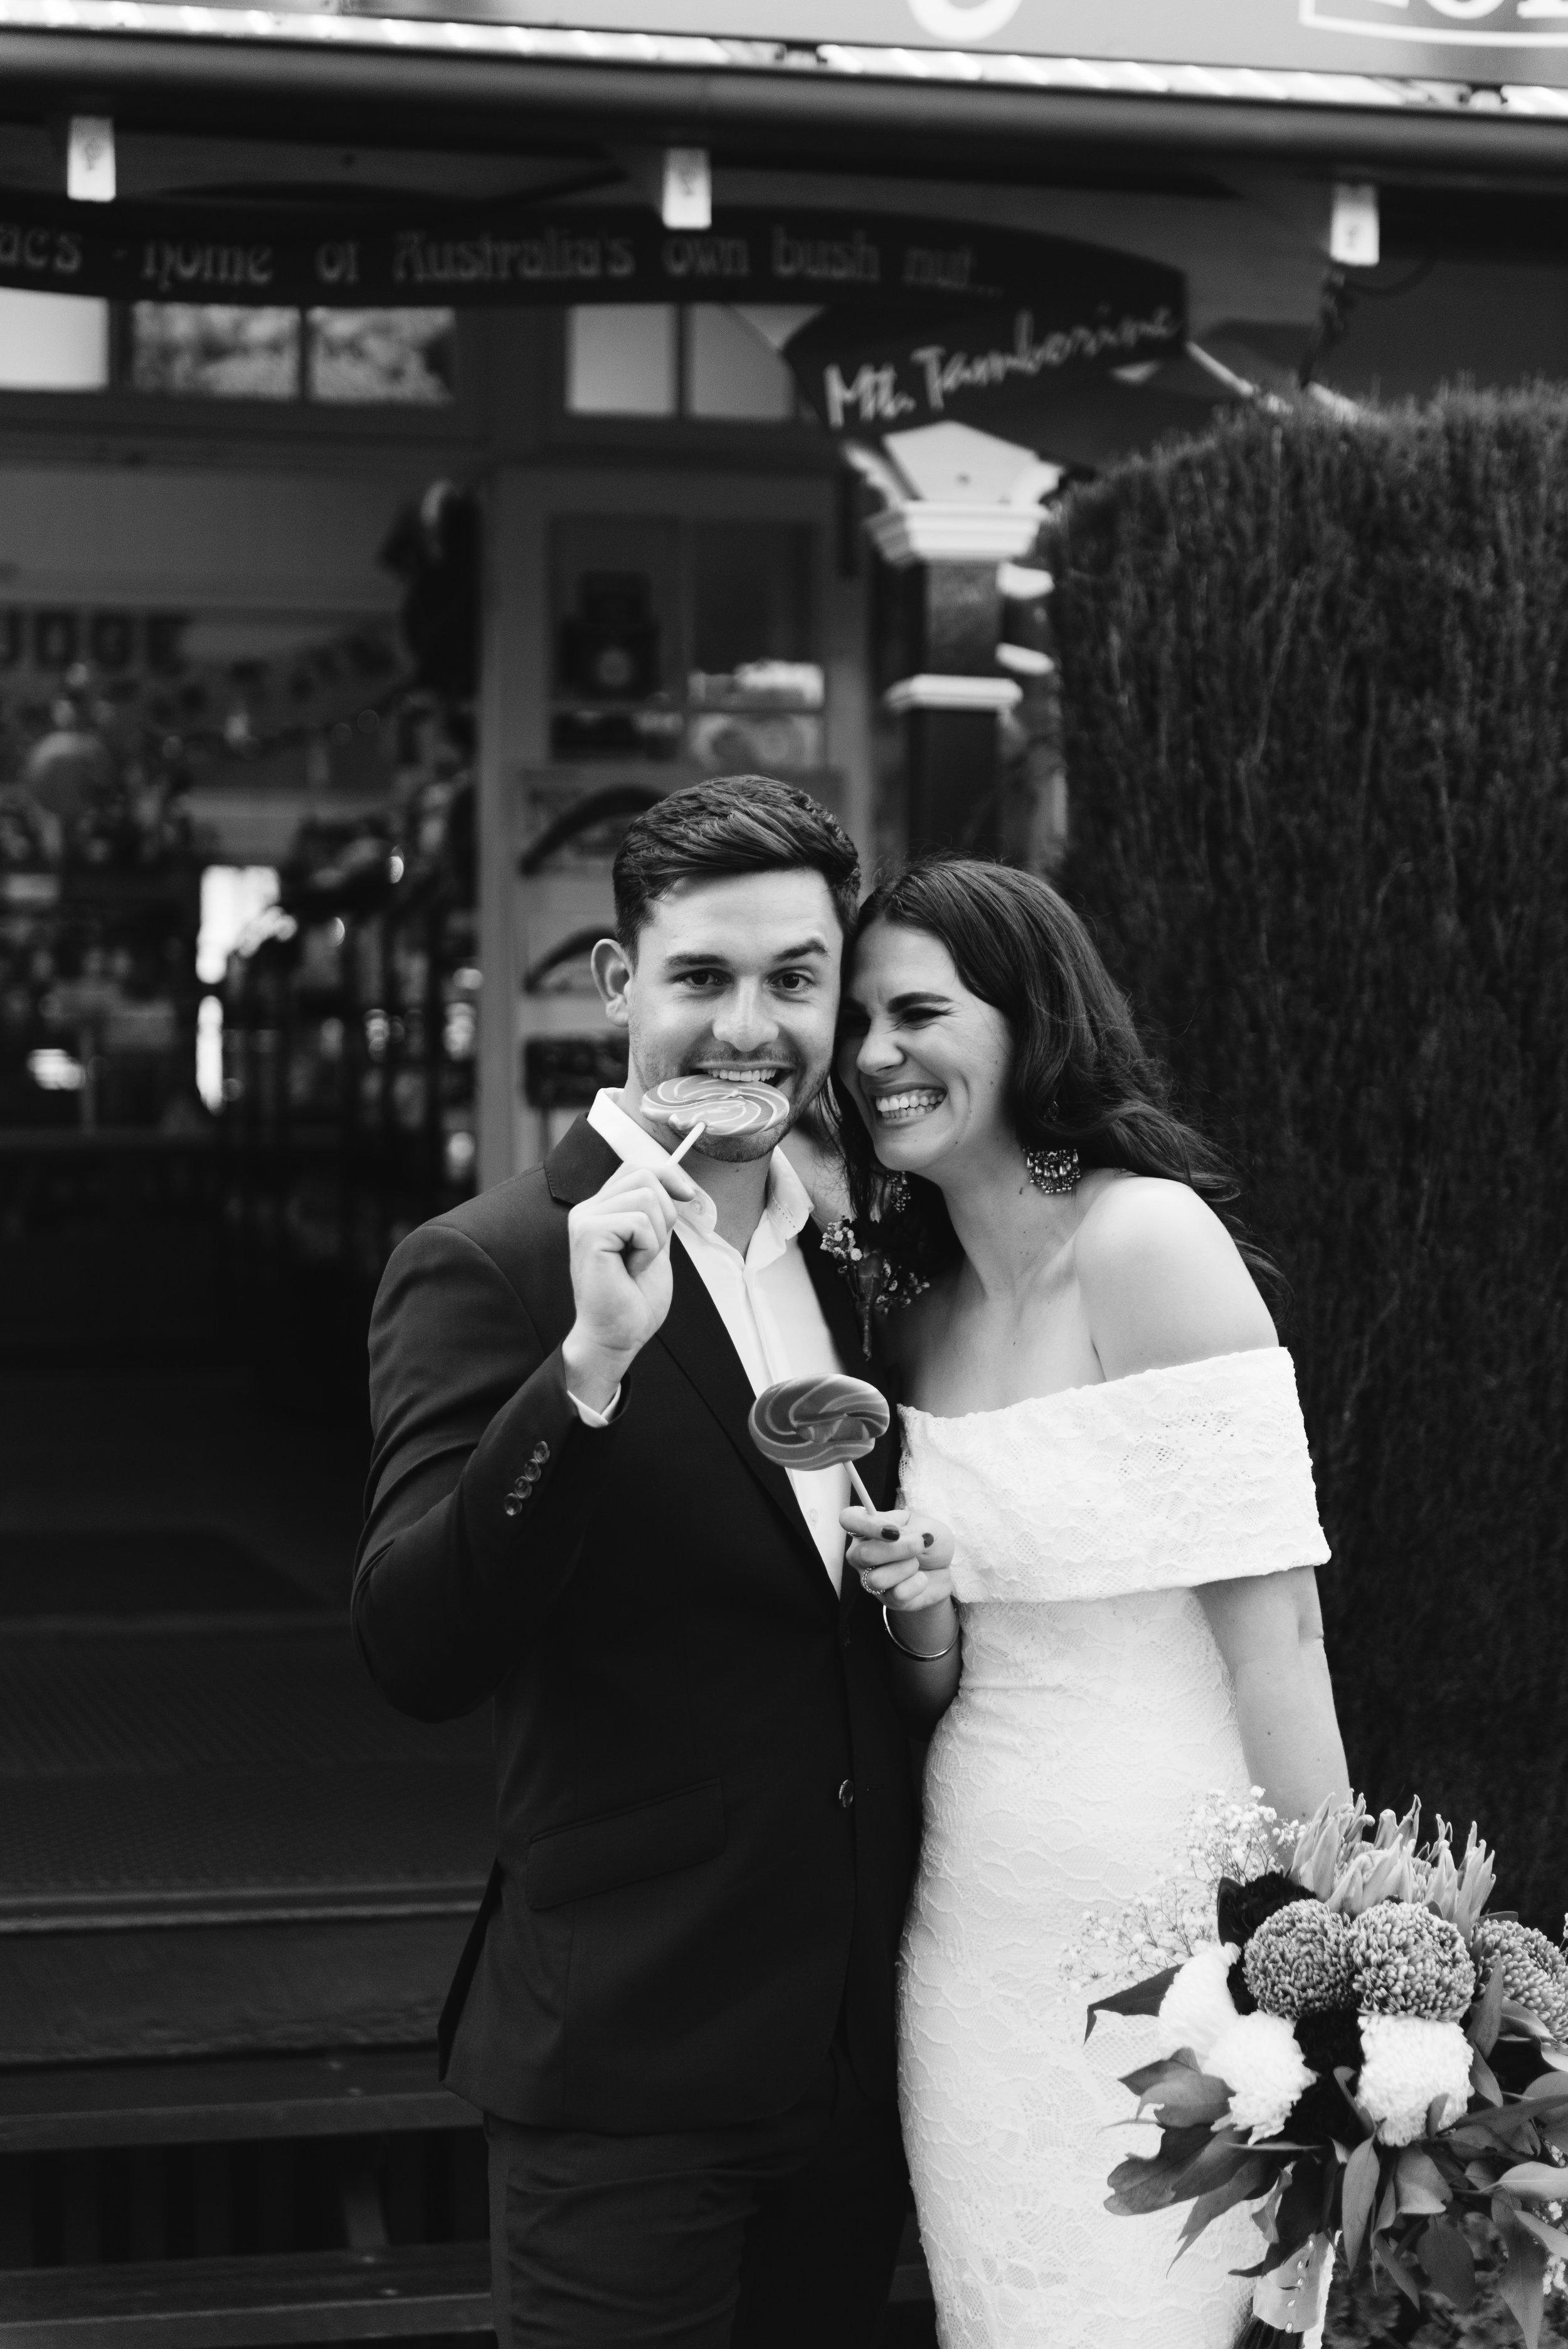 brisbane-gold-coast-sunshine-coast-wedding-photographer-mount-tamborine-wedding-1-50.jpg